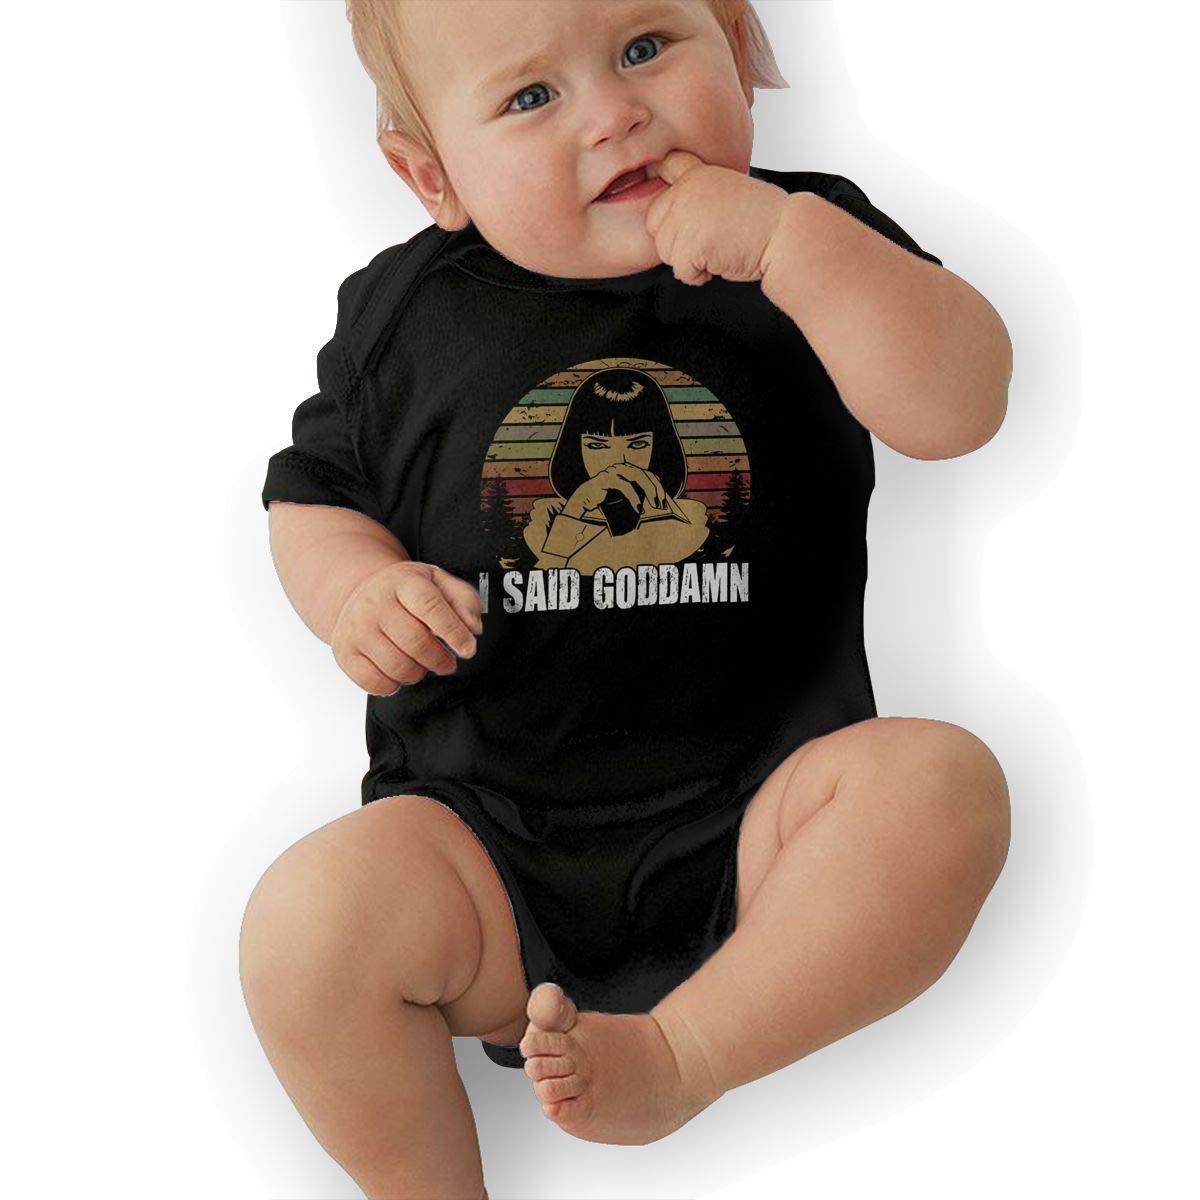 SHWPAKFA Infant I Said Goddamn Adorable Soft Music Band Jersey Bodysuit,Black,0-3M